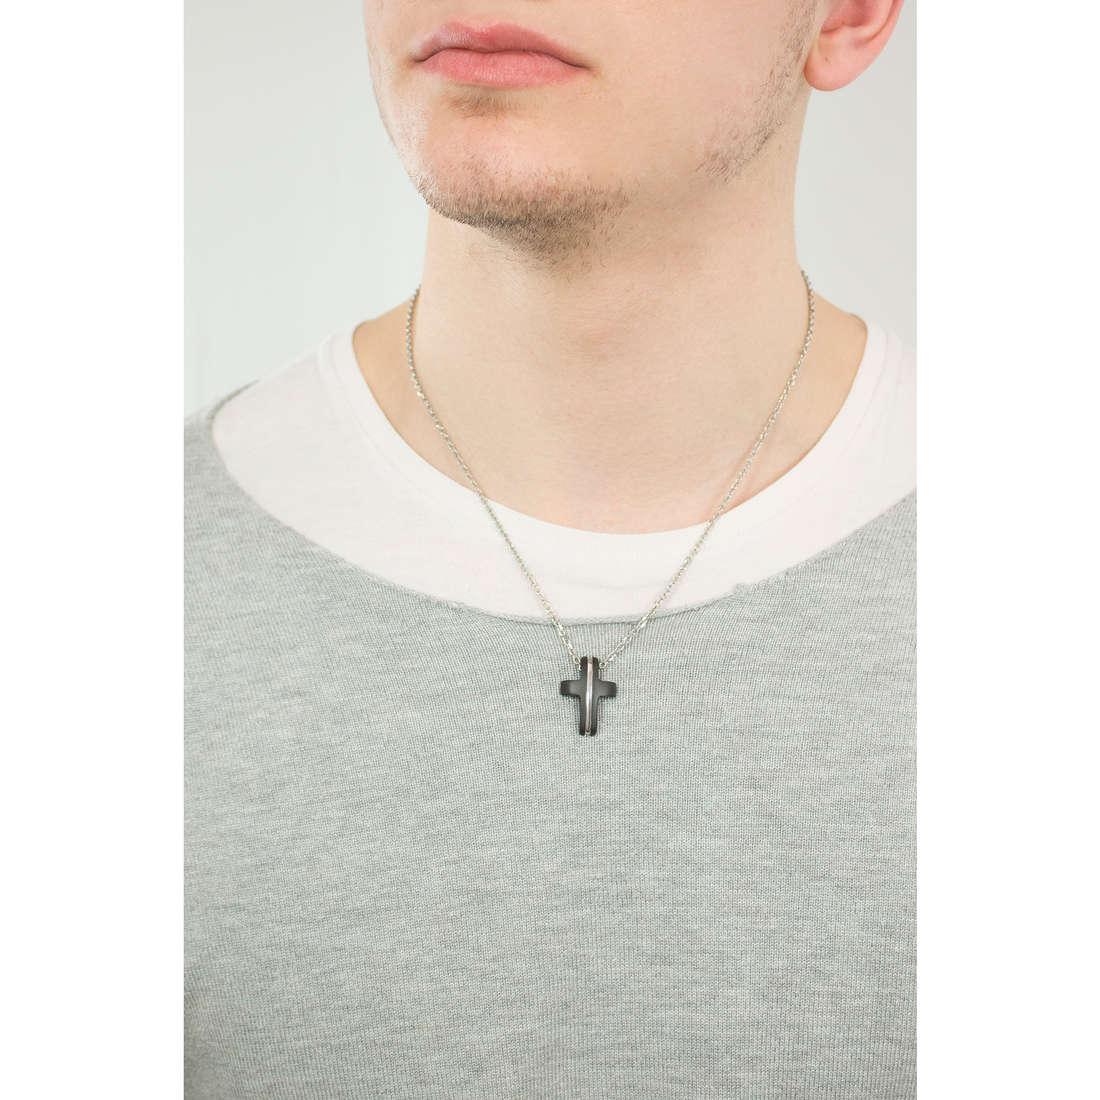 Brosway collane Medieval uomo BMV03 indosso